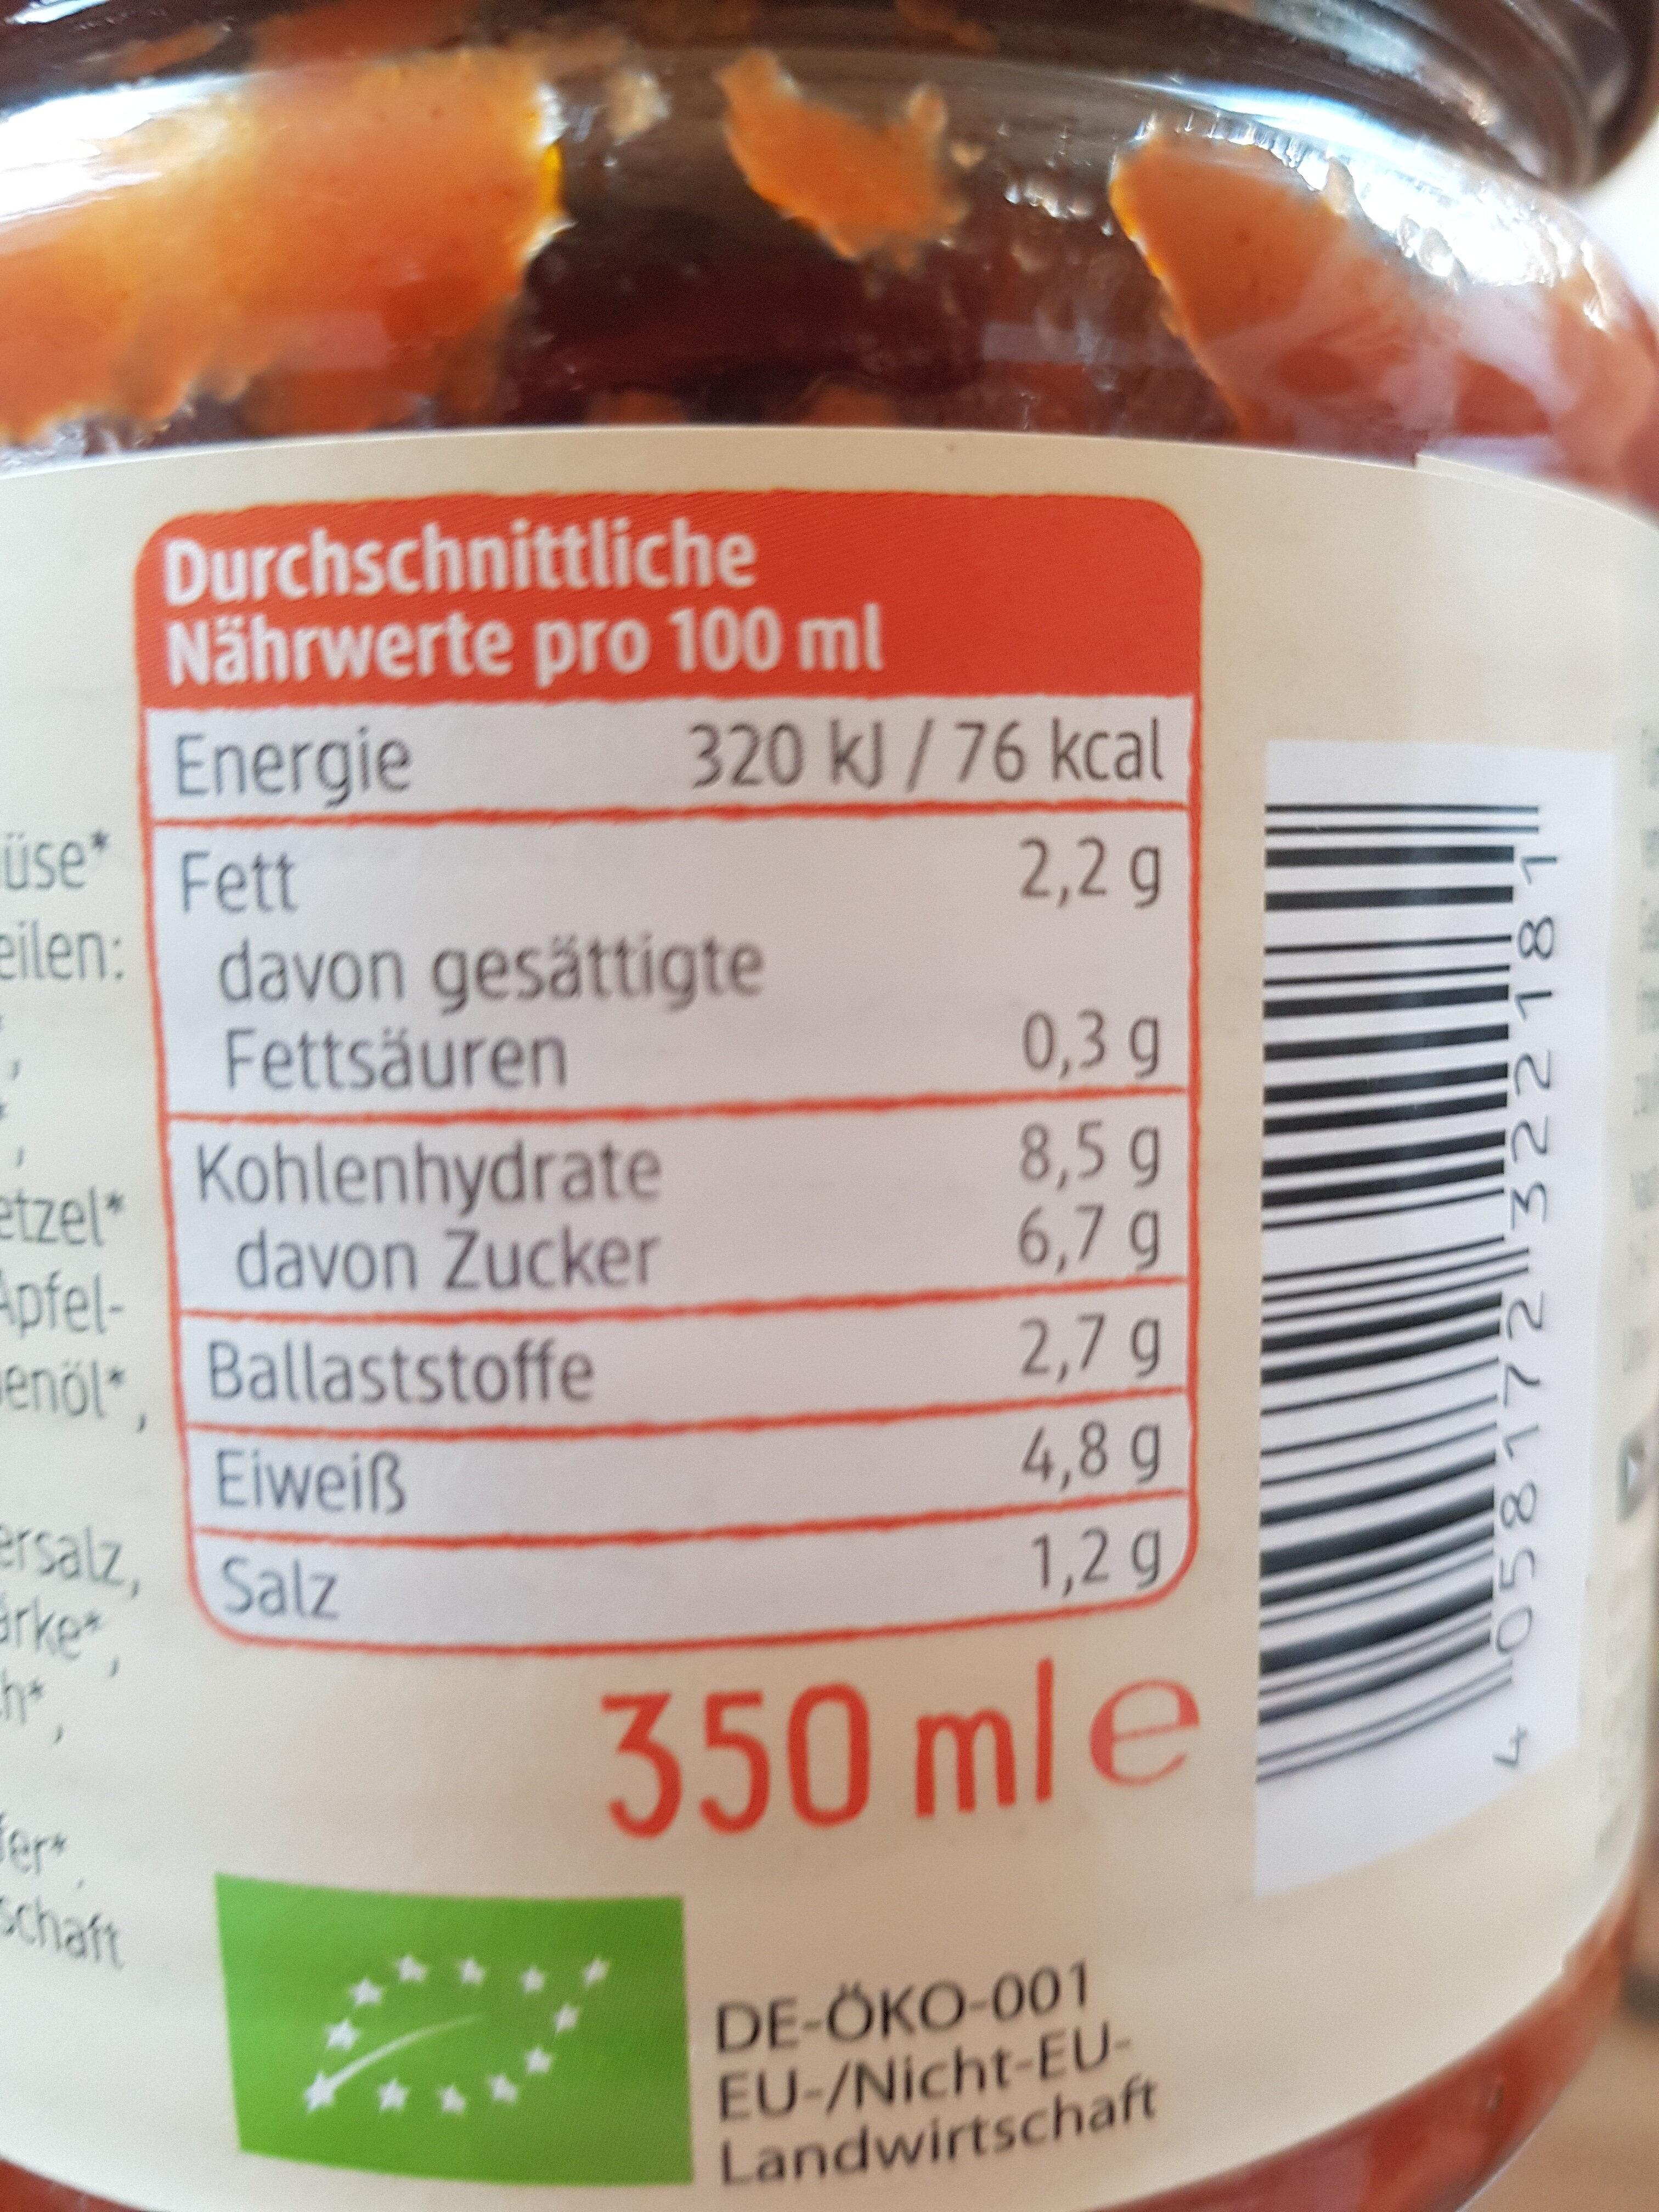 Vegane Bolognese mit Sojaschnetzel - Voedingswaarden - de